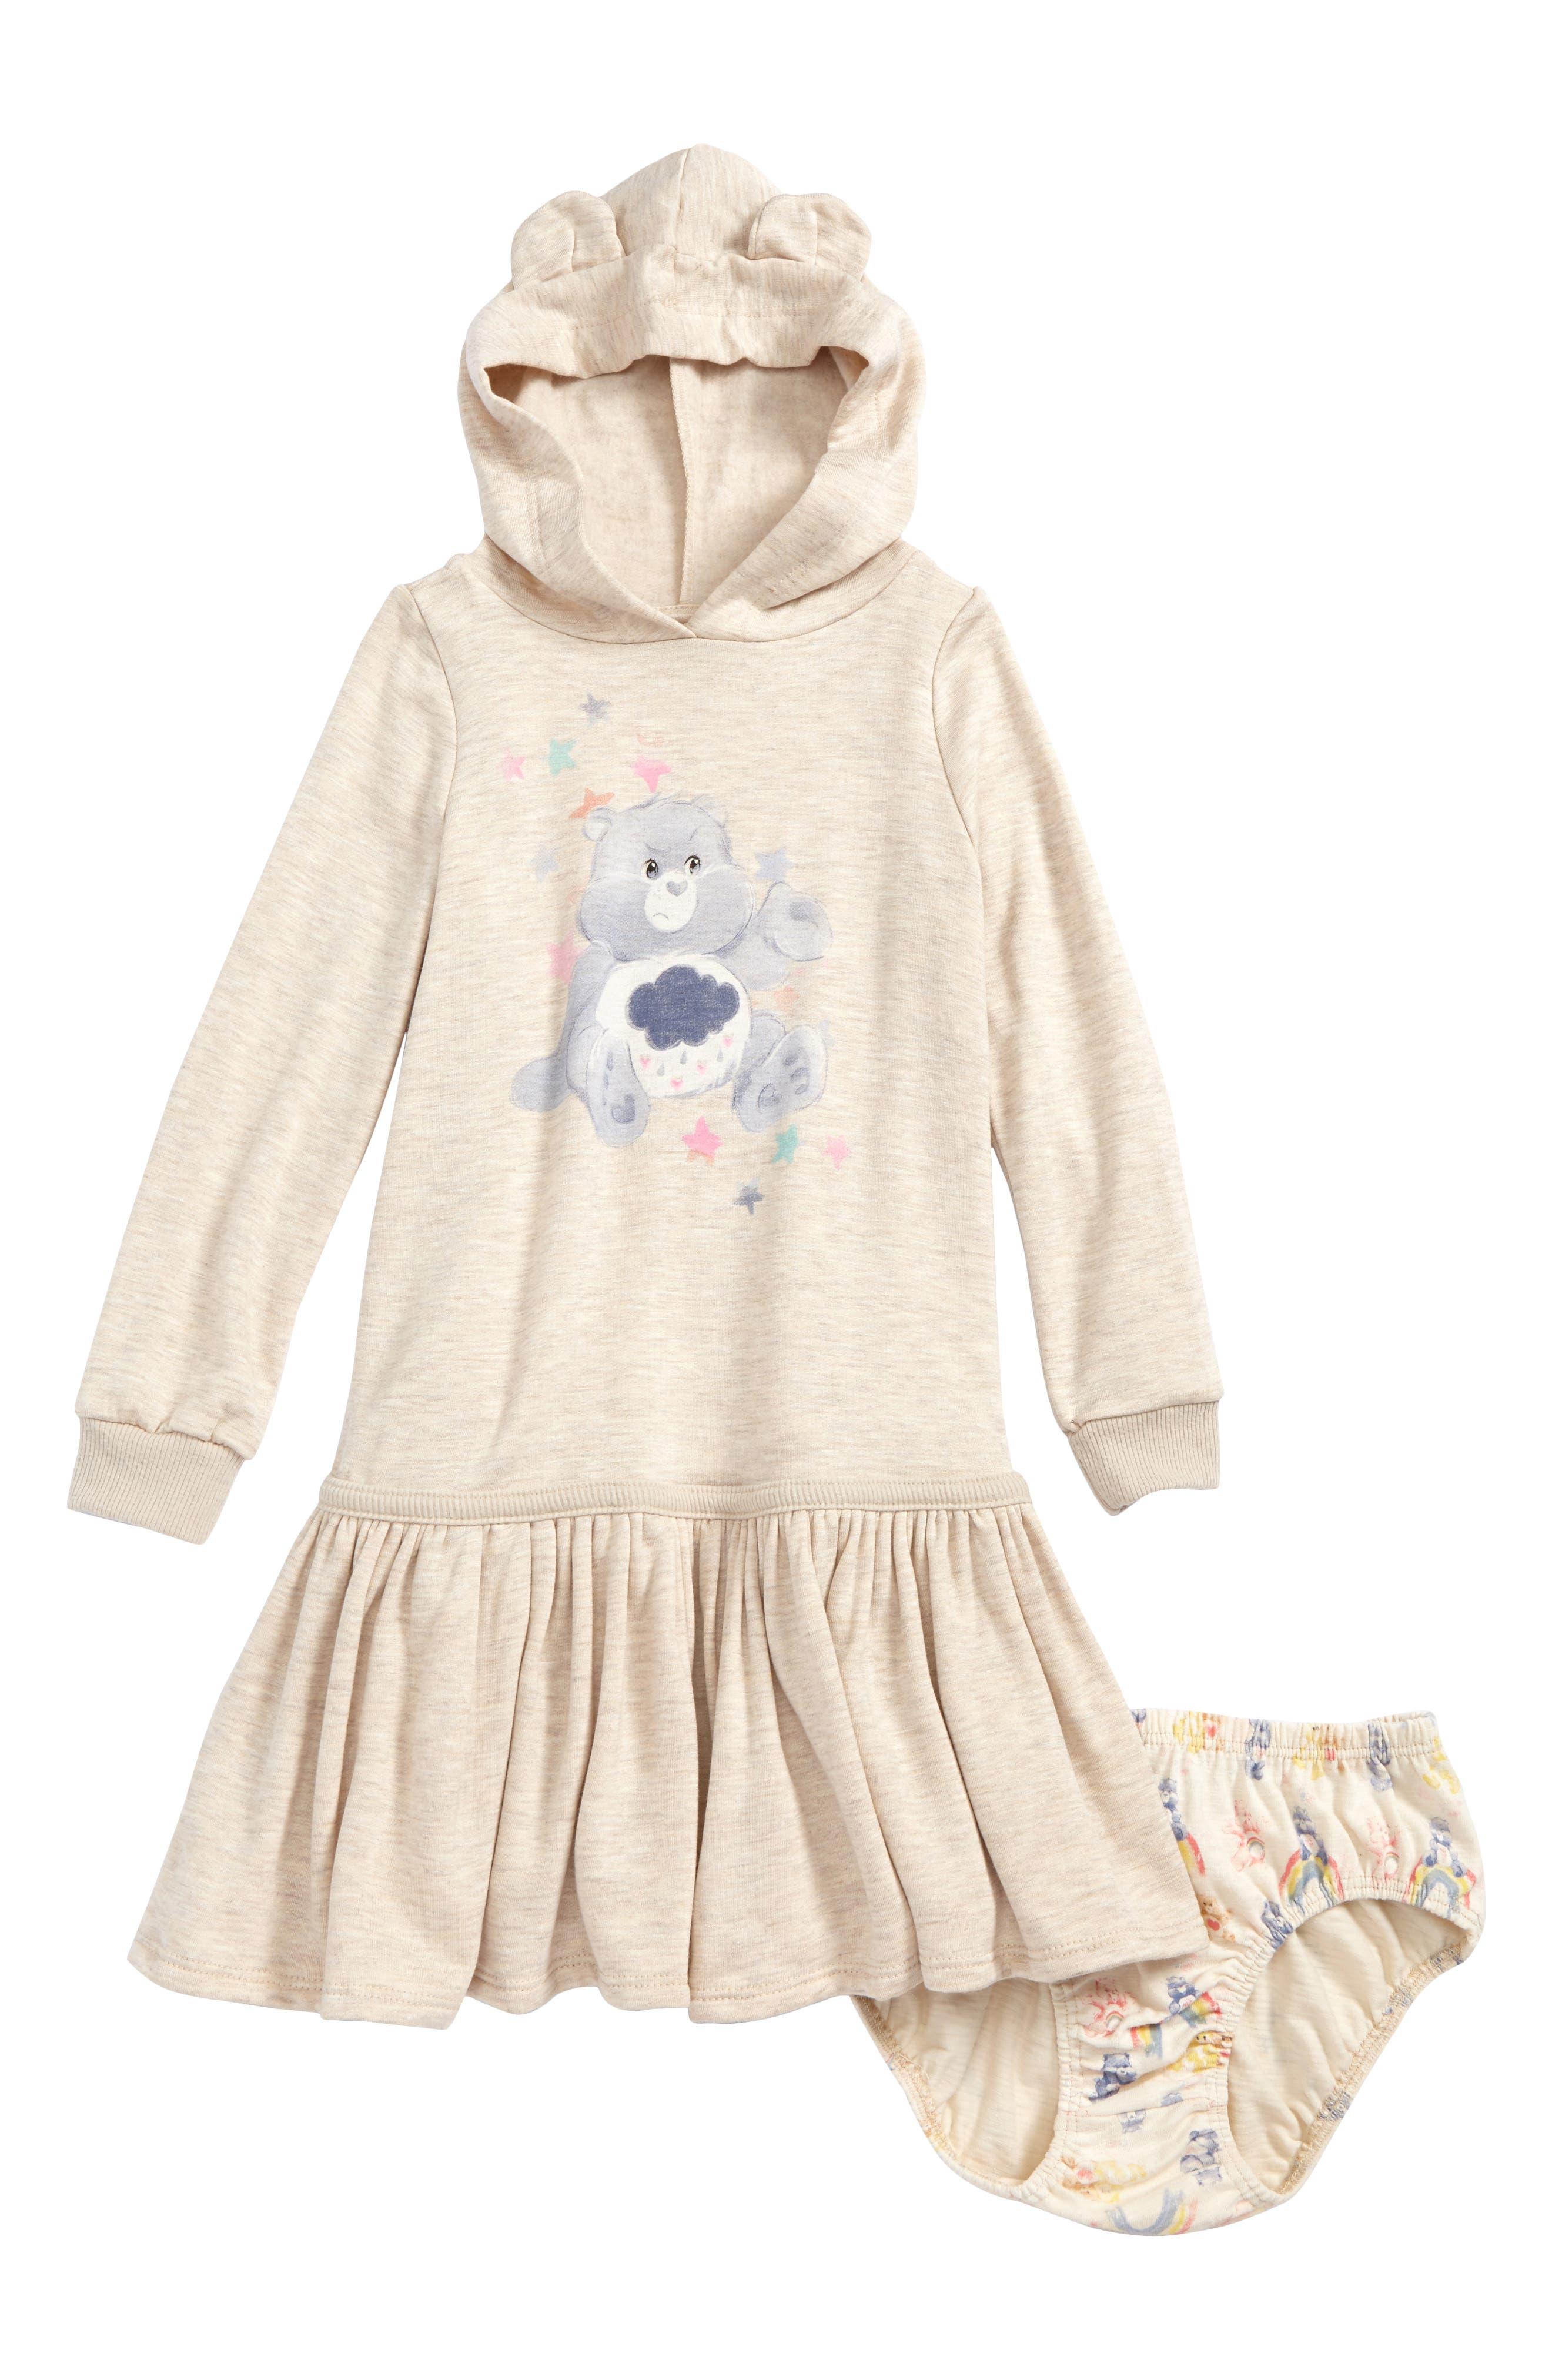 Care Bears™ by Fine Threads Hooded Dress (Toddler Girls & Little Girls)